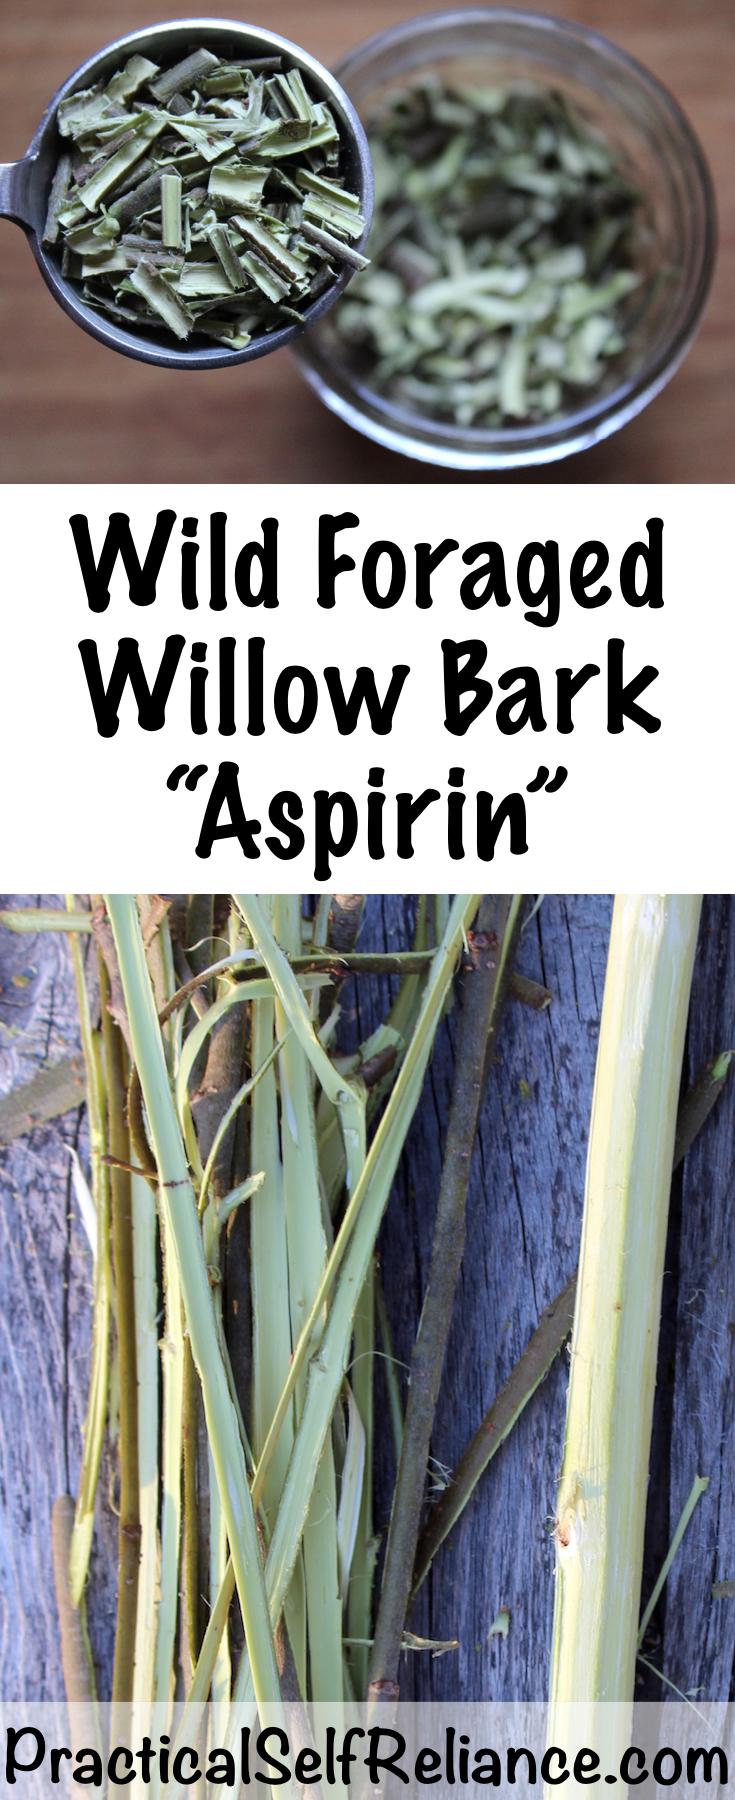 Foraging Willow Bark for Medicine ~ Natural Wild Aspirin #willow #willowbark #painrelief #herbs #herbalist #herbalism #medicine #forage #foraging #wildcrafting #survival #naturalremedy #homestead